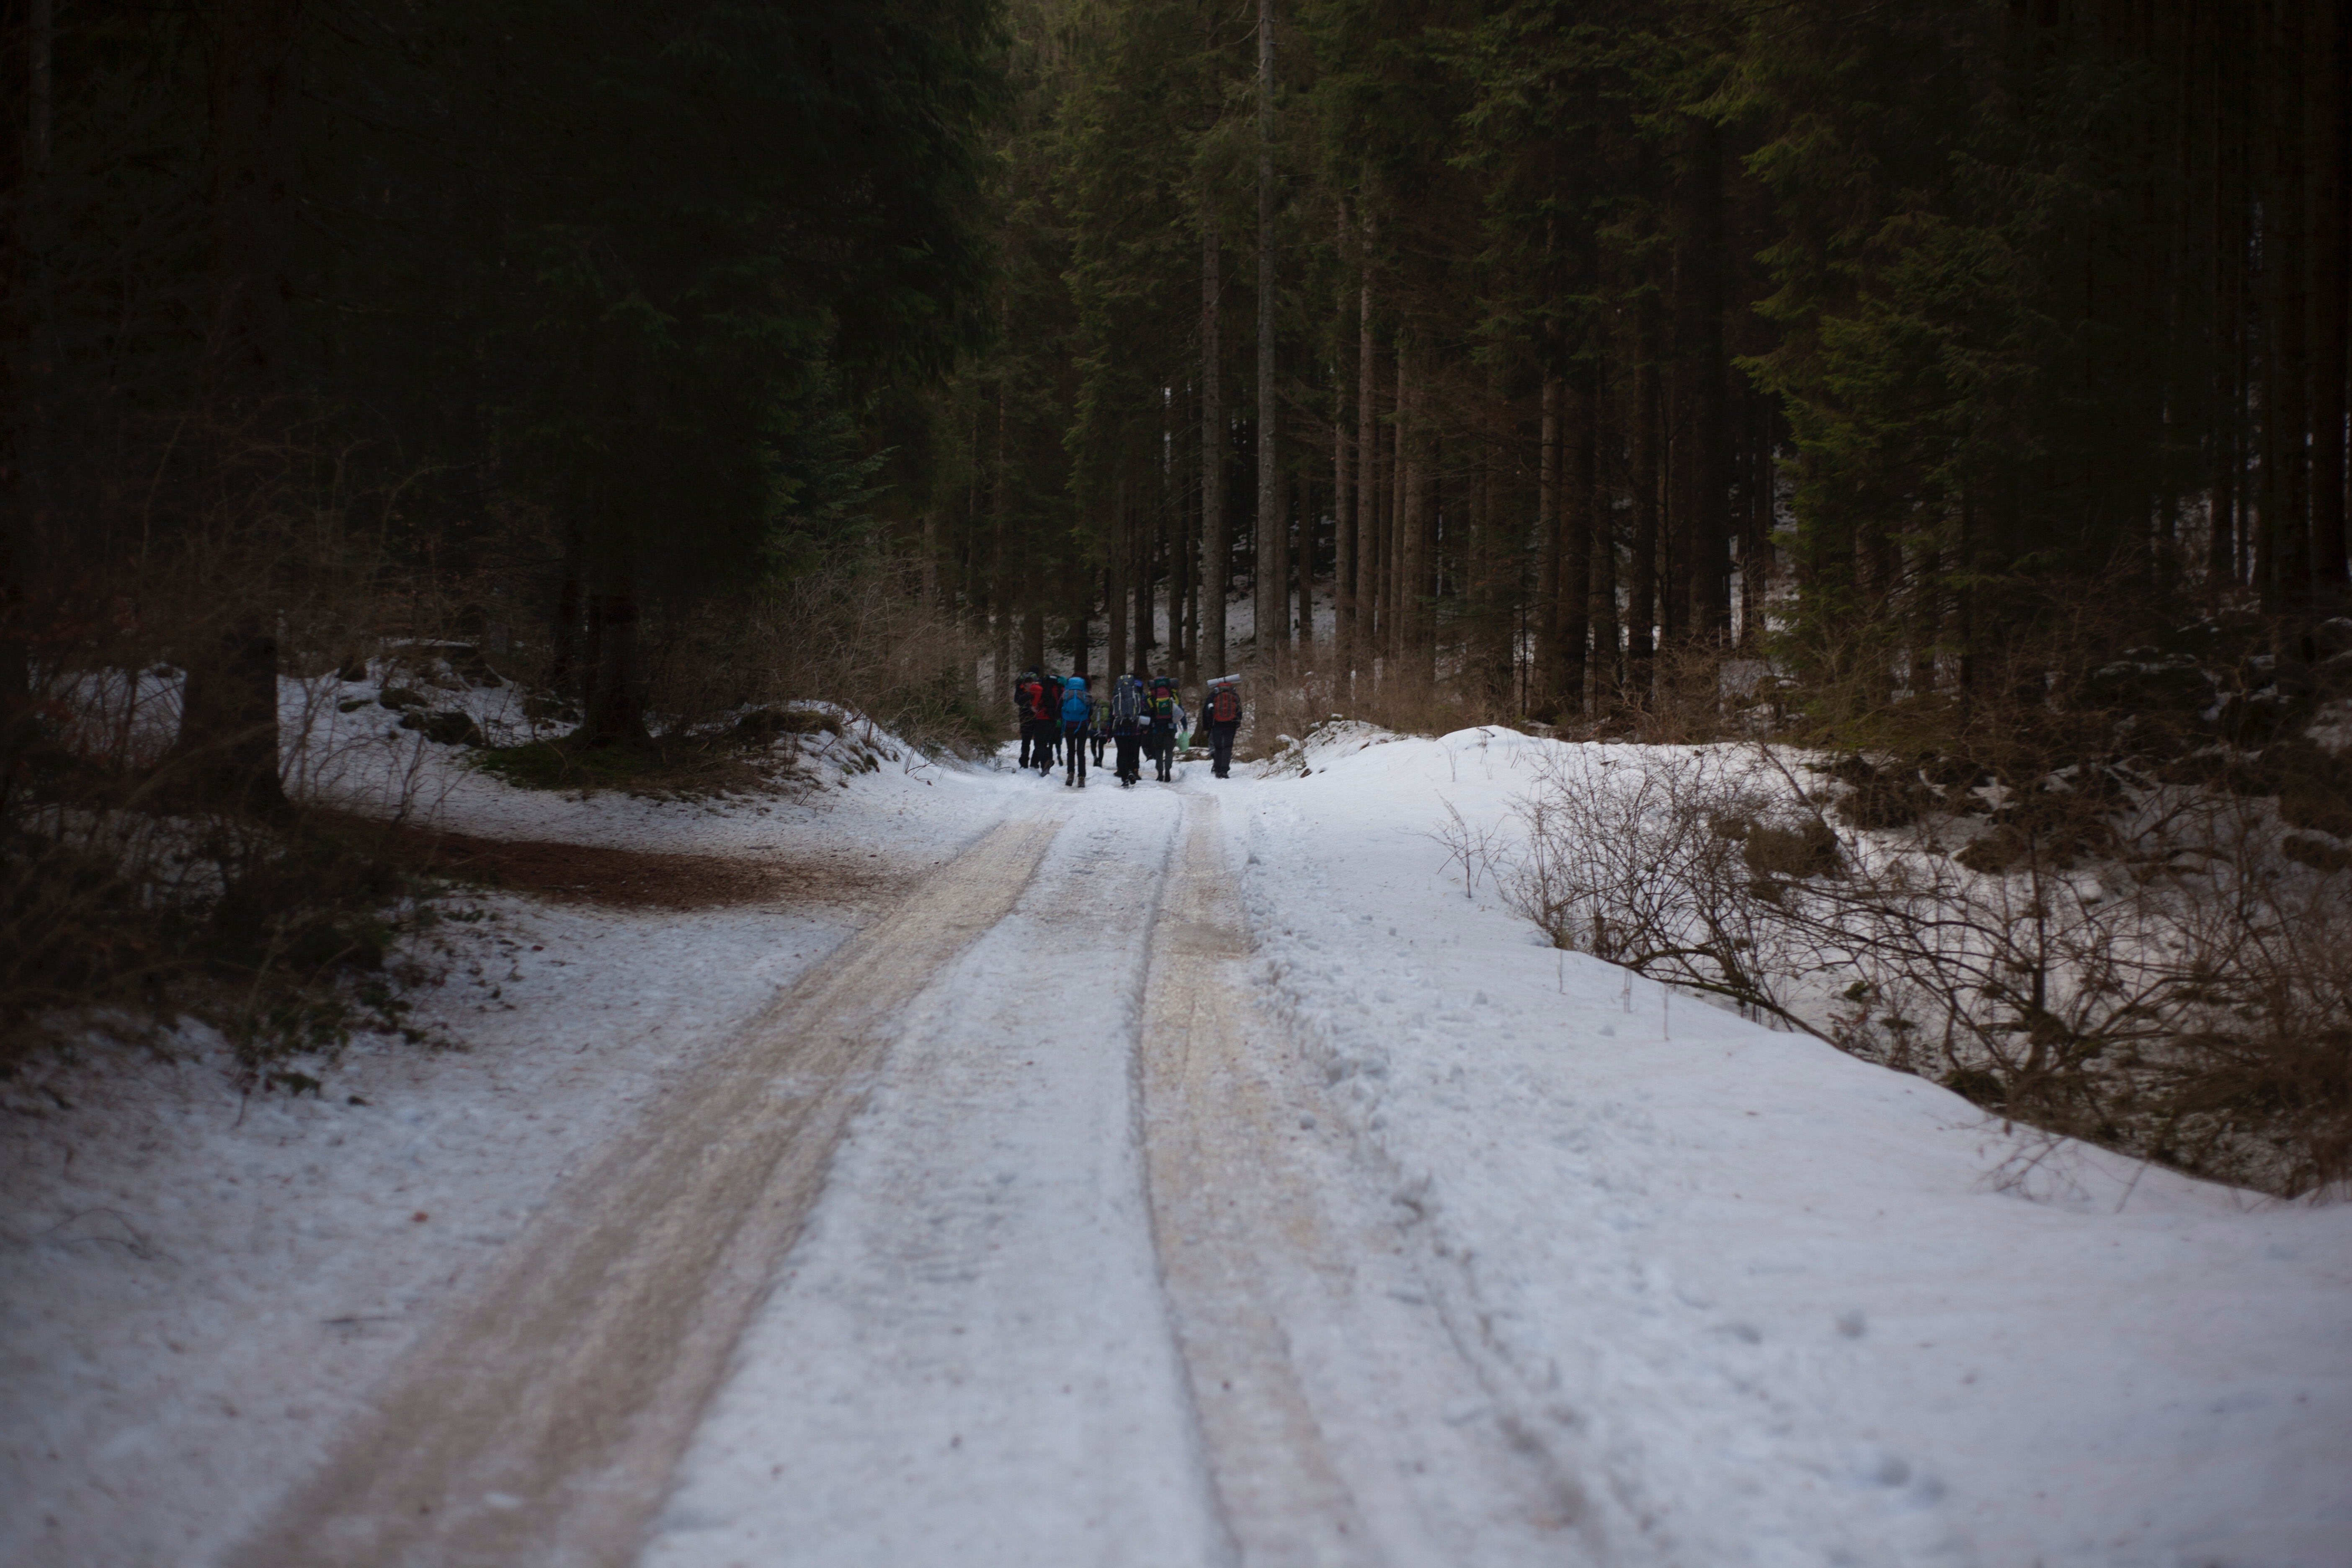 People walking on icy road photo